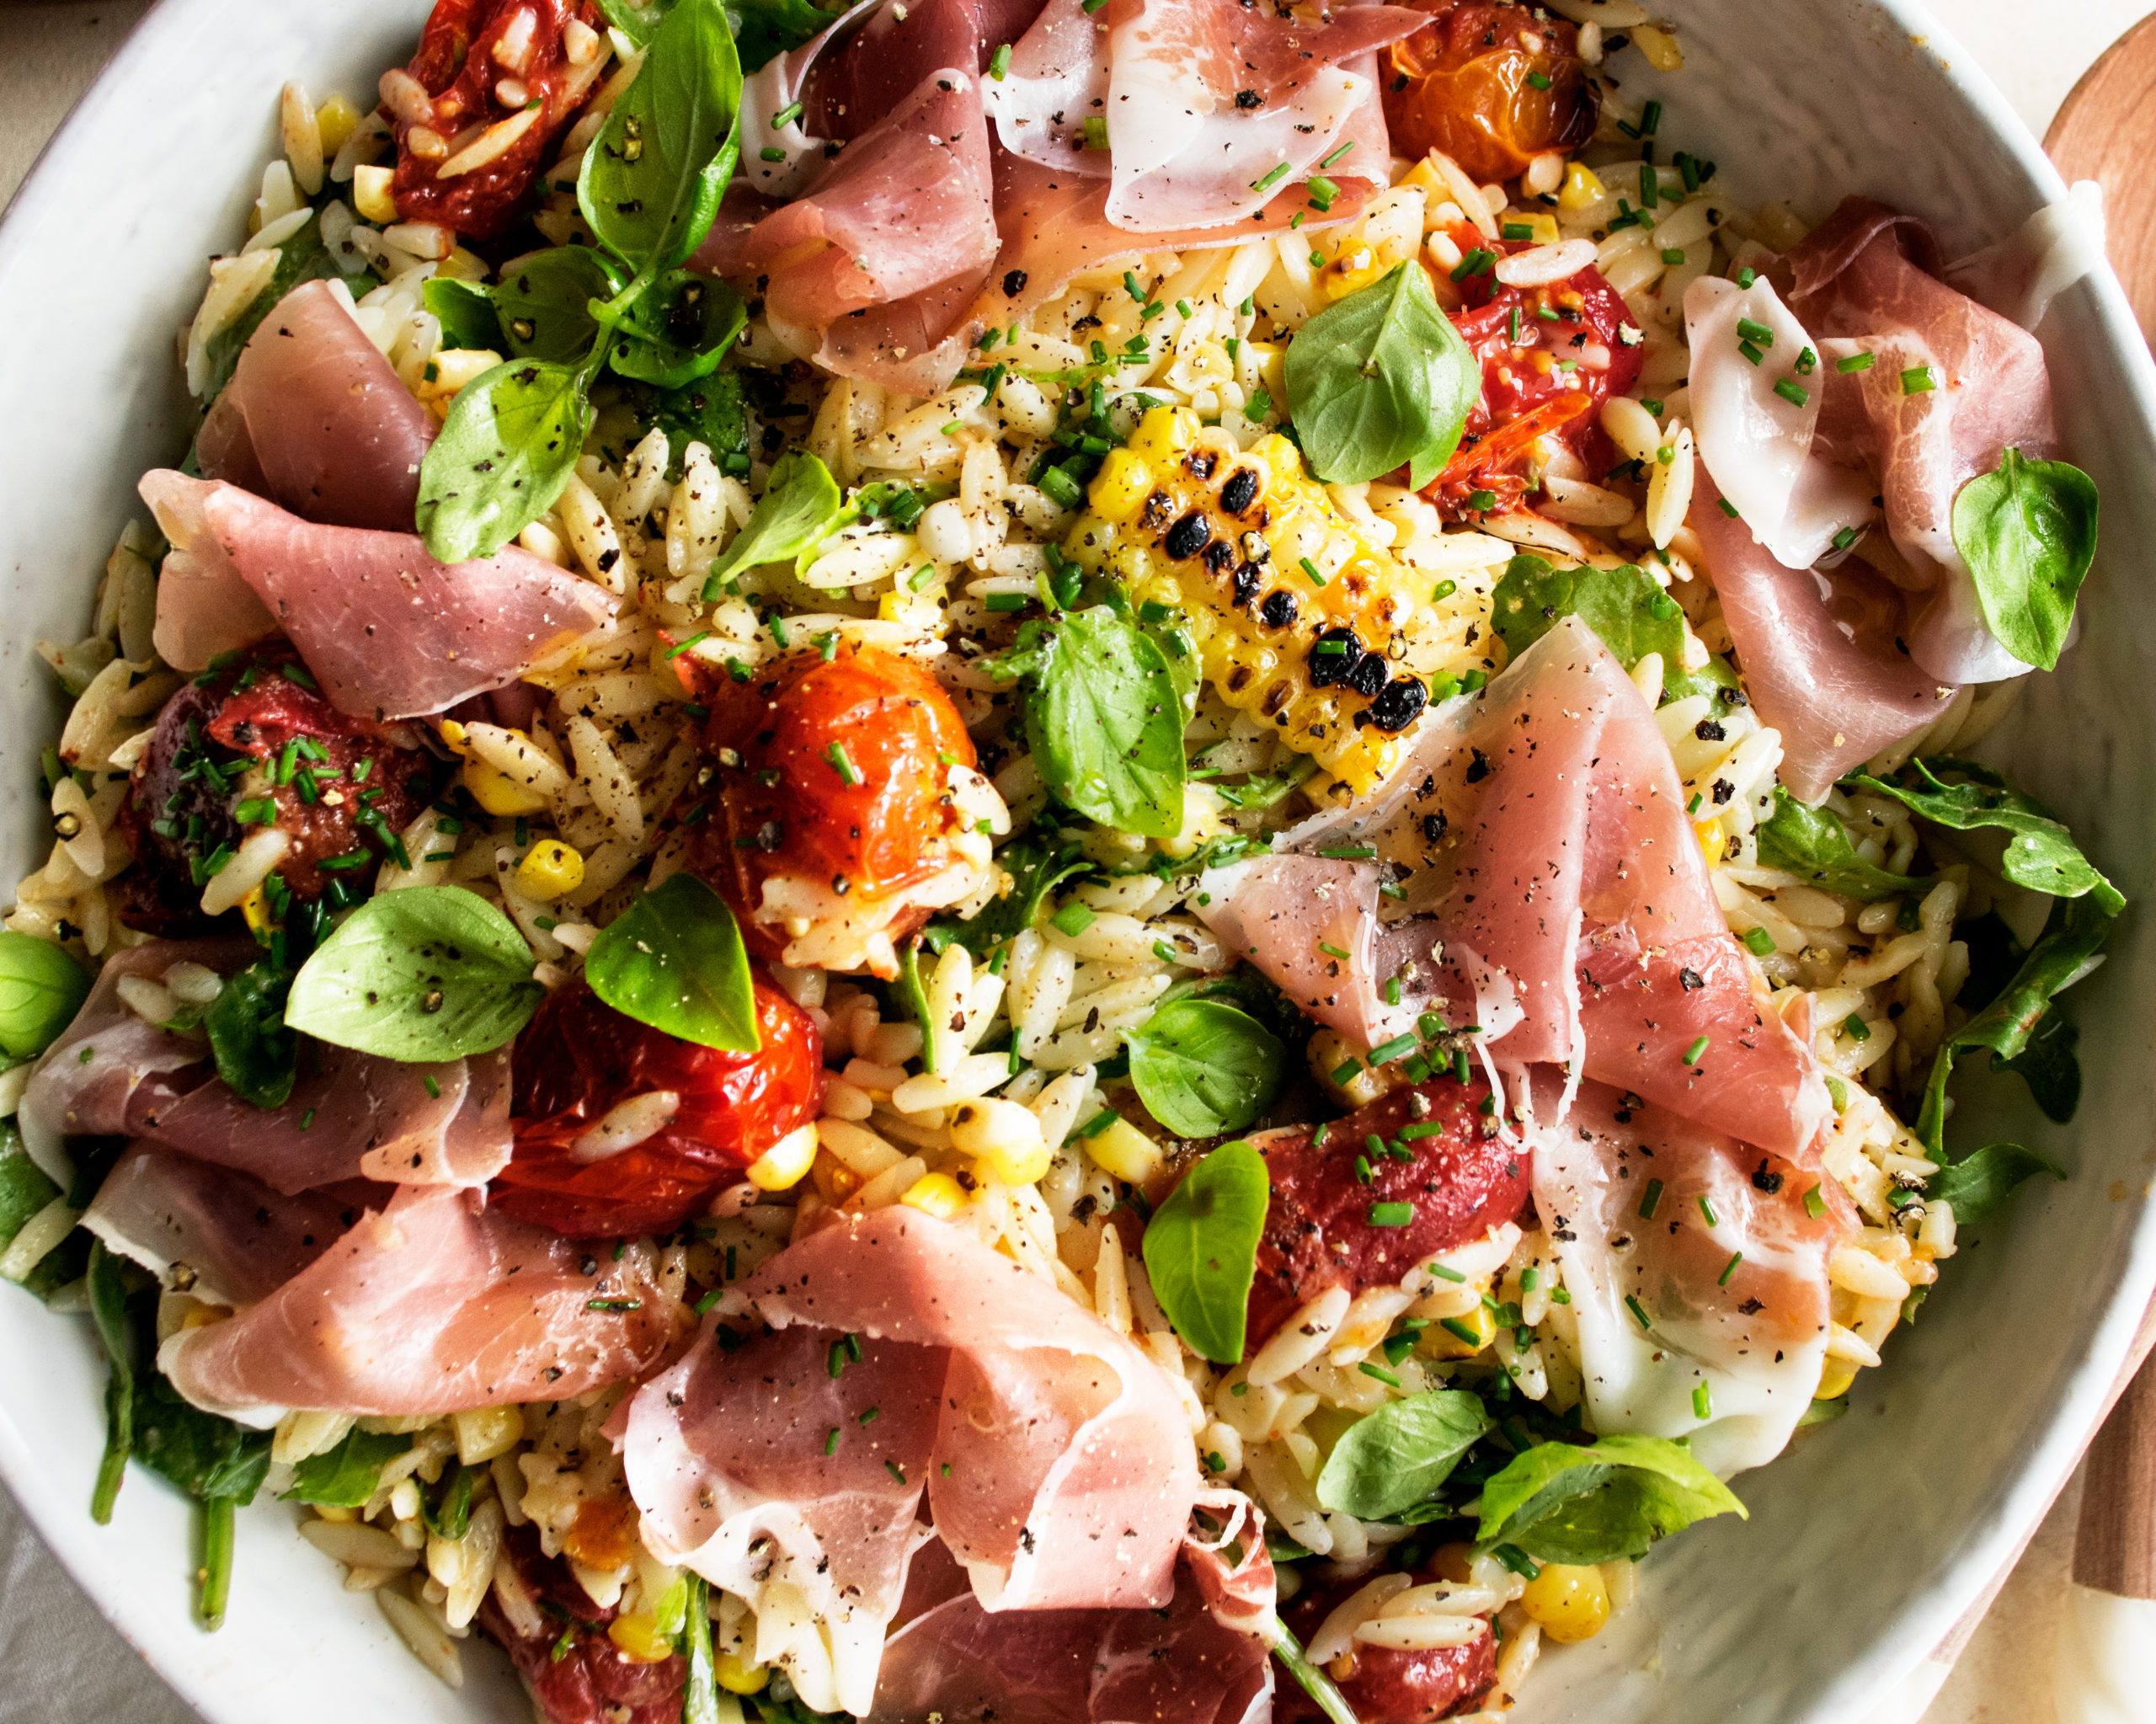 Orzo Salad With Prosciutto & Parmesan Vinaigrette - The Original Dish